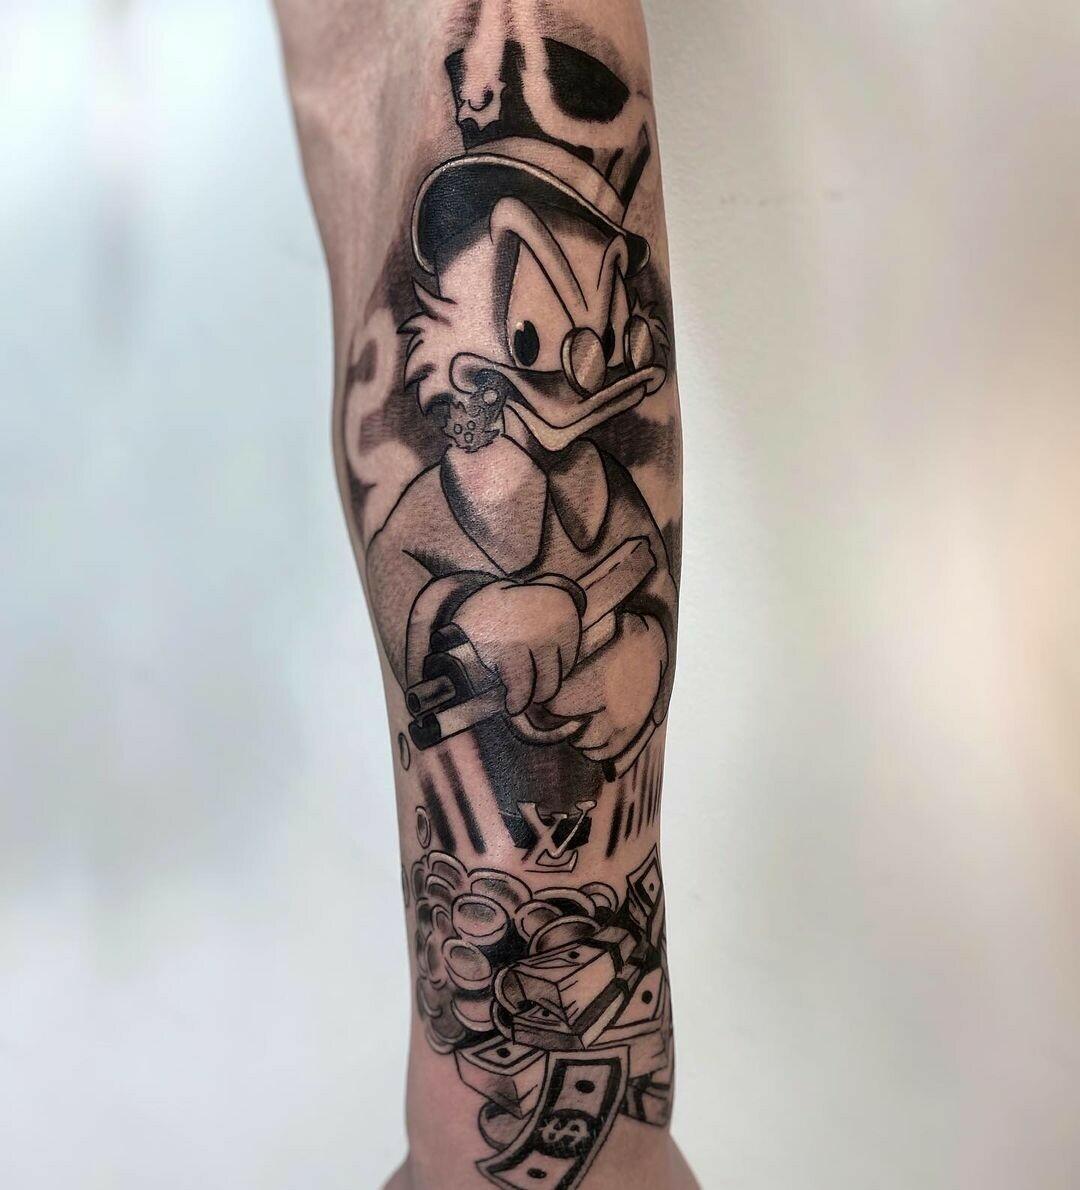 Inksearch tattoo Venomdopee